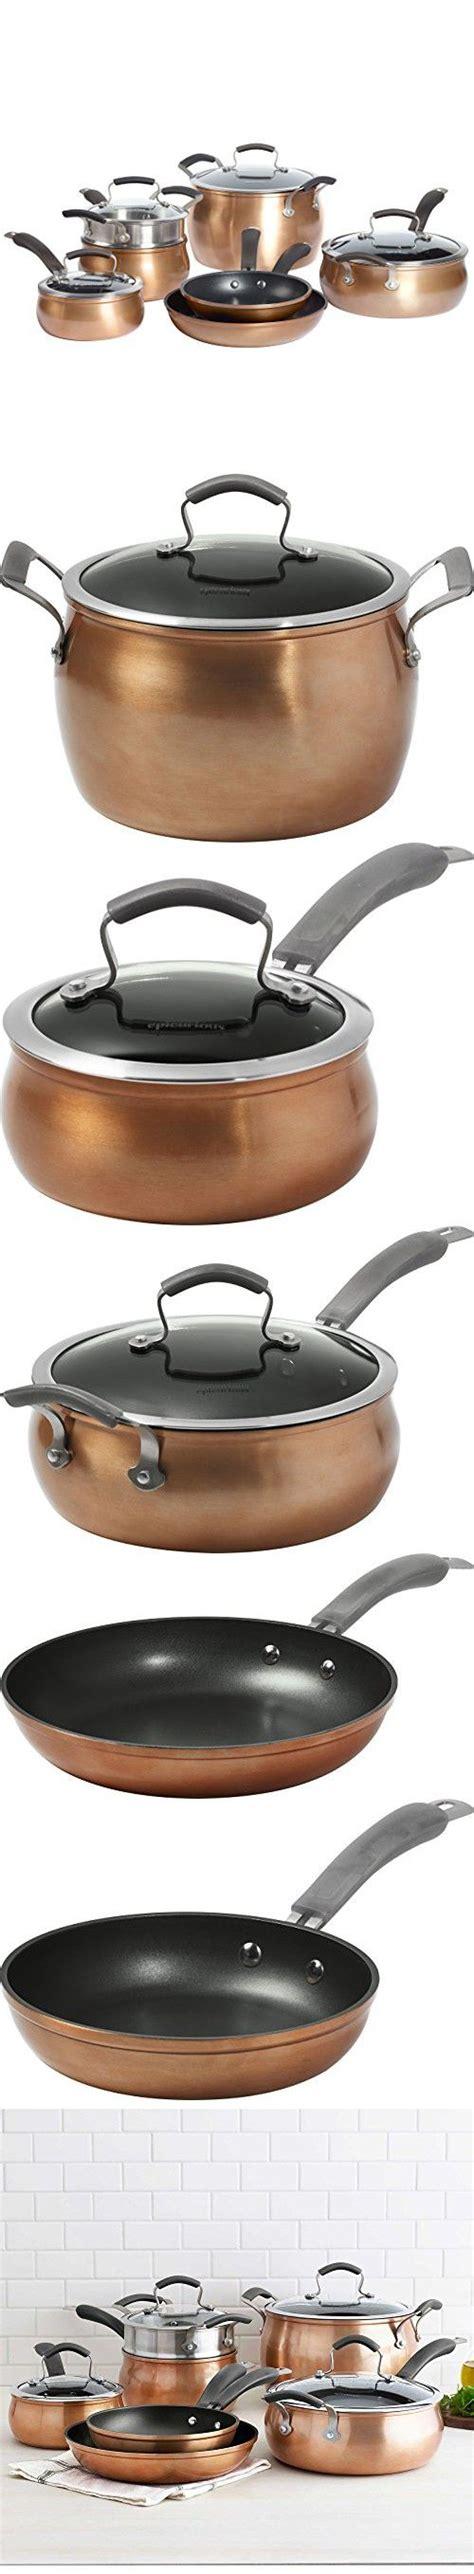 epicurious aluminum nonstick  piece cookware set  copper cookware set kitchen cookware